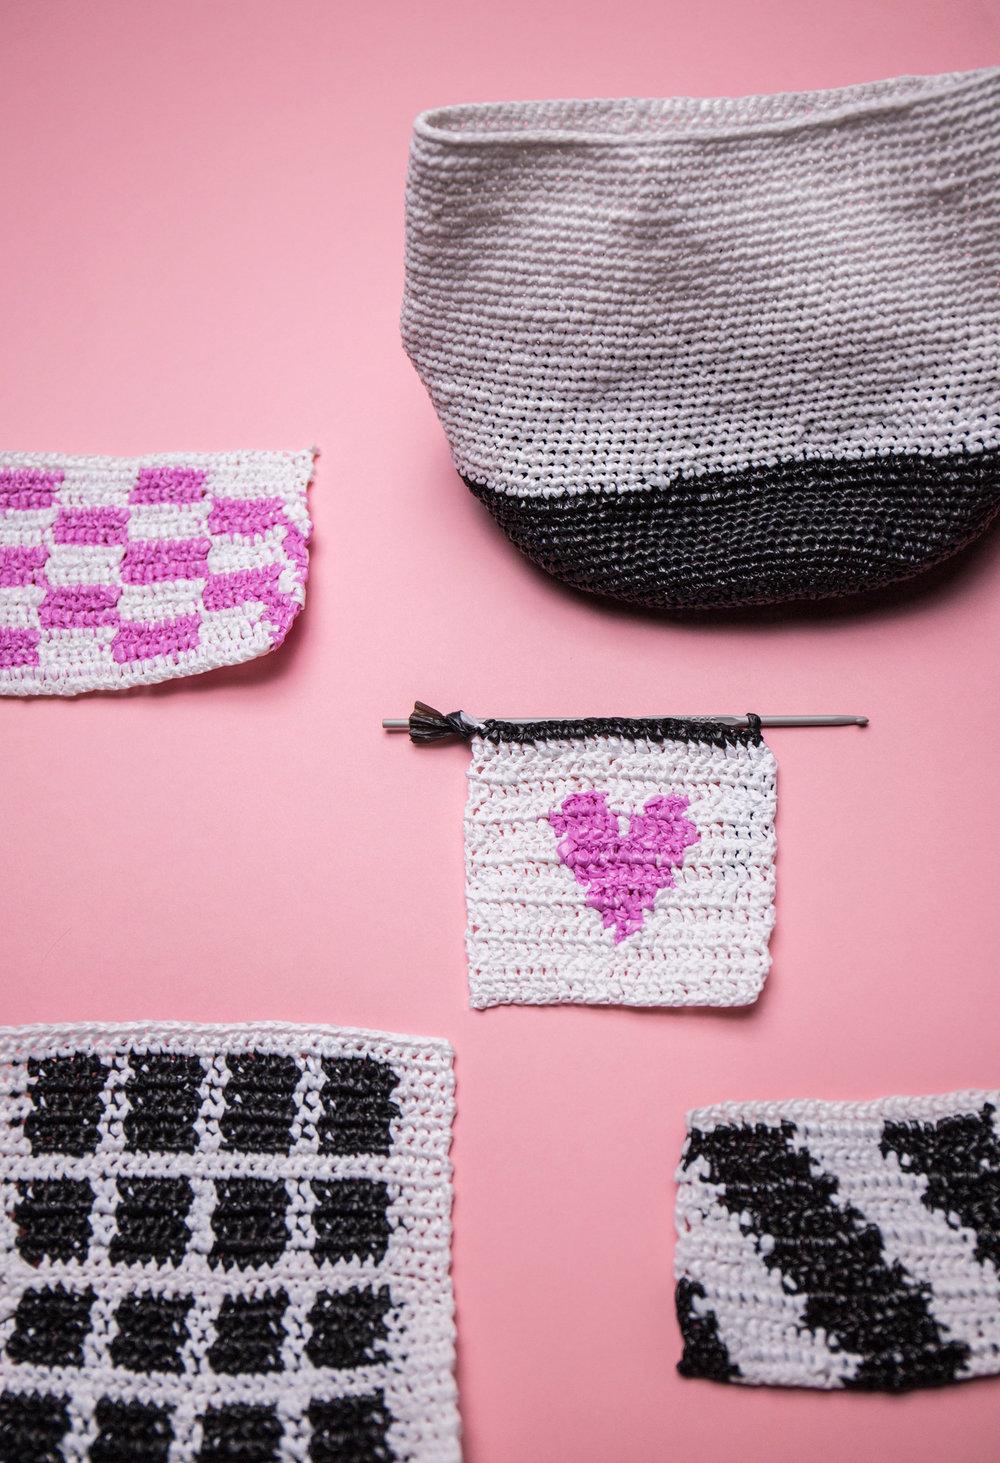 crochet-prototype-111017.jpg